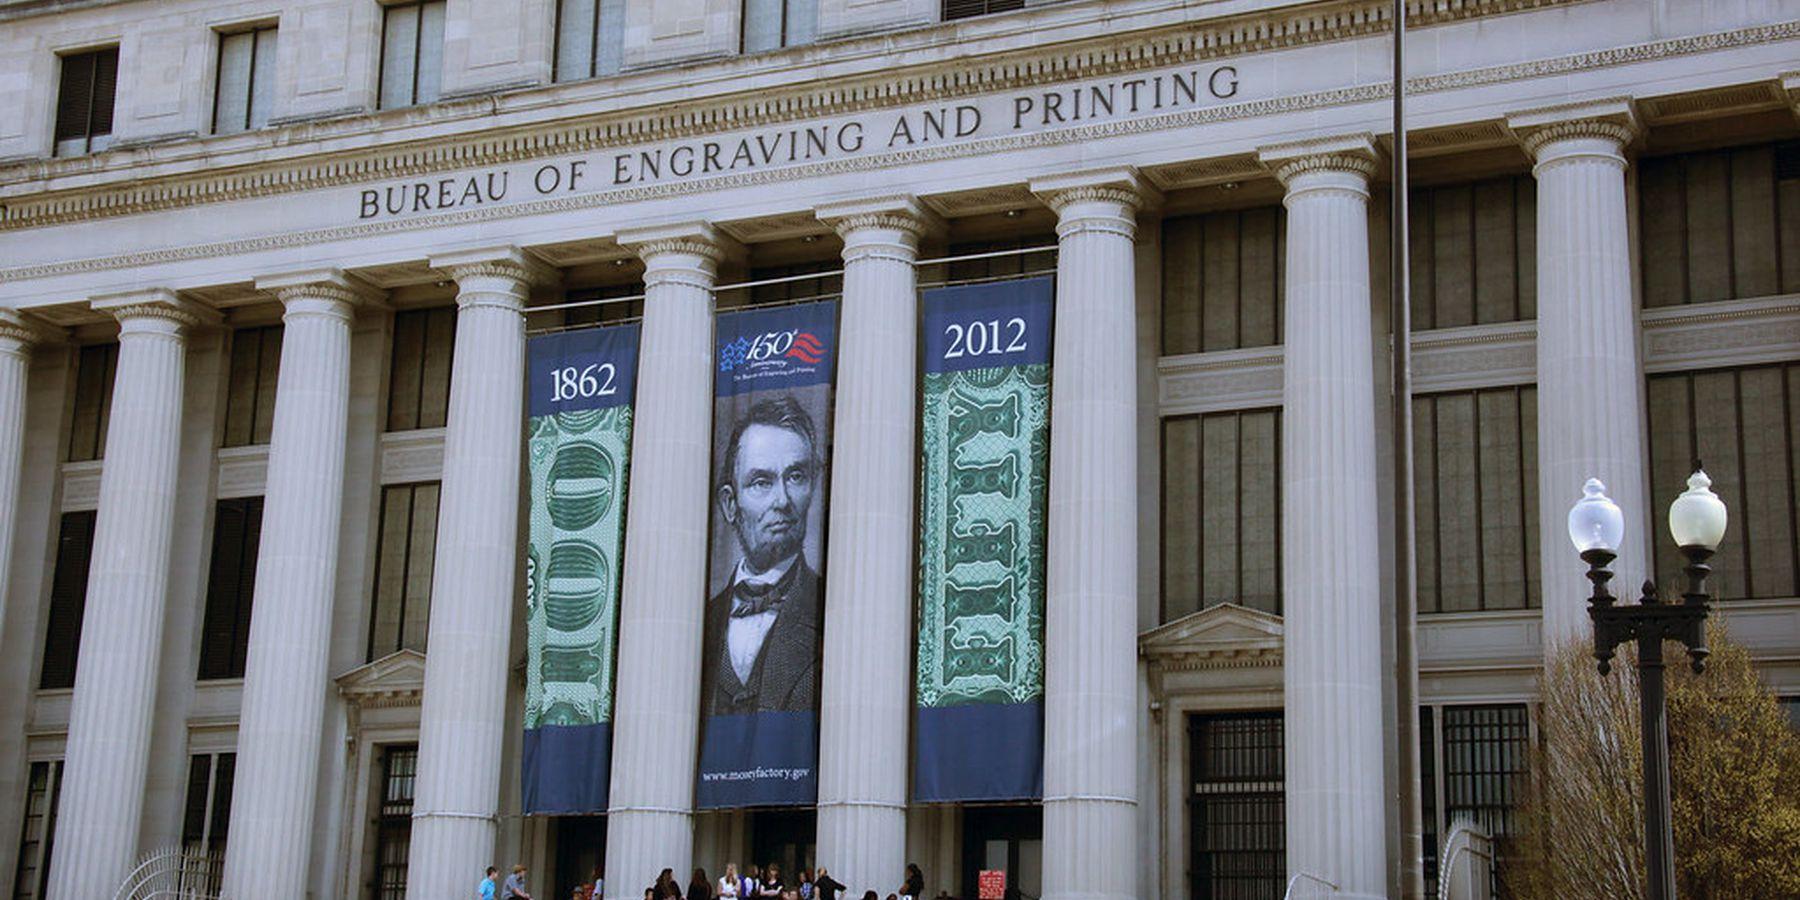 Bureau of Engraving and Printing - Washington D.C. - Doets Reizen